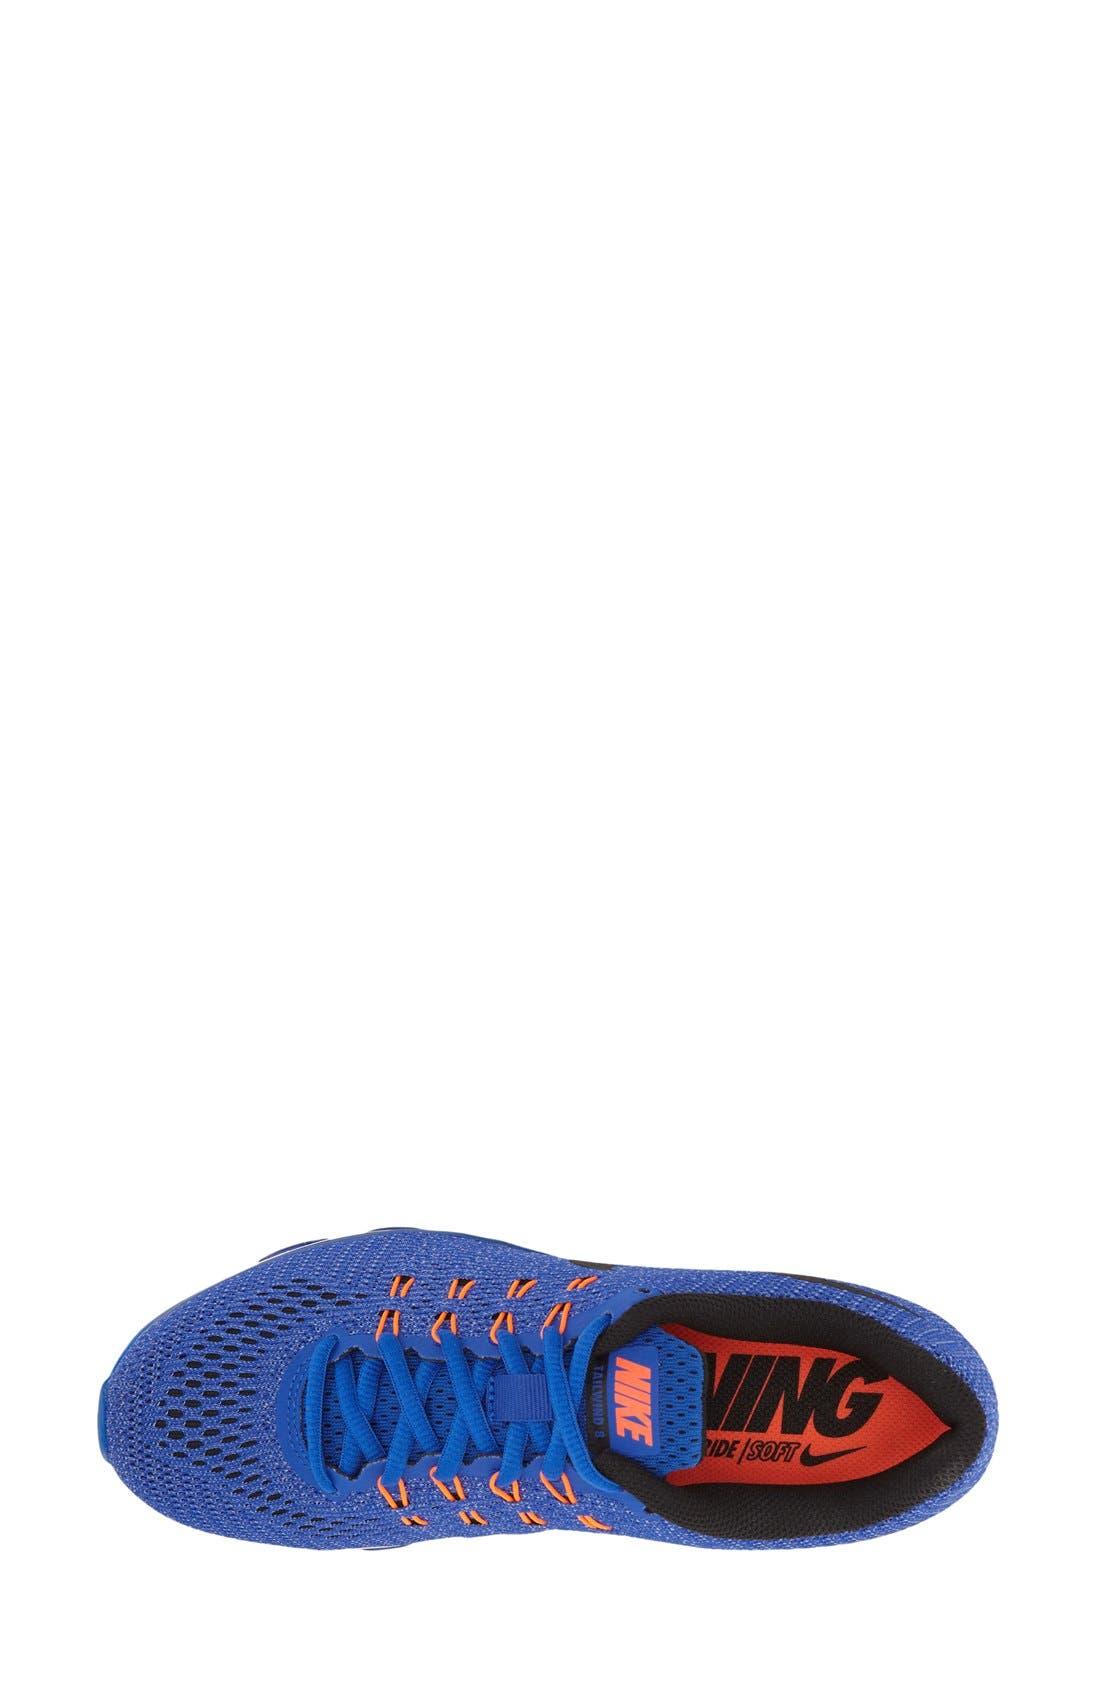 Alternate Image 3  - Nike 'Air Max Tailwind 8' Running Shoe (Women)